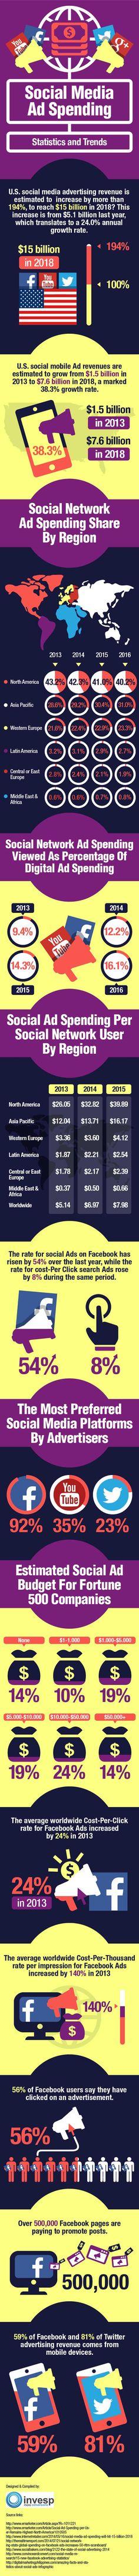 Global #SocialMedia Ad Spending – Statistics, Trends And Prediction #Infographic - #marketing